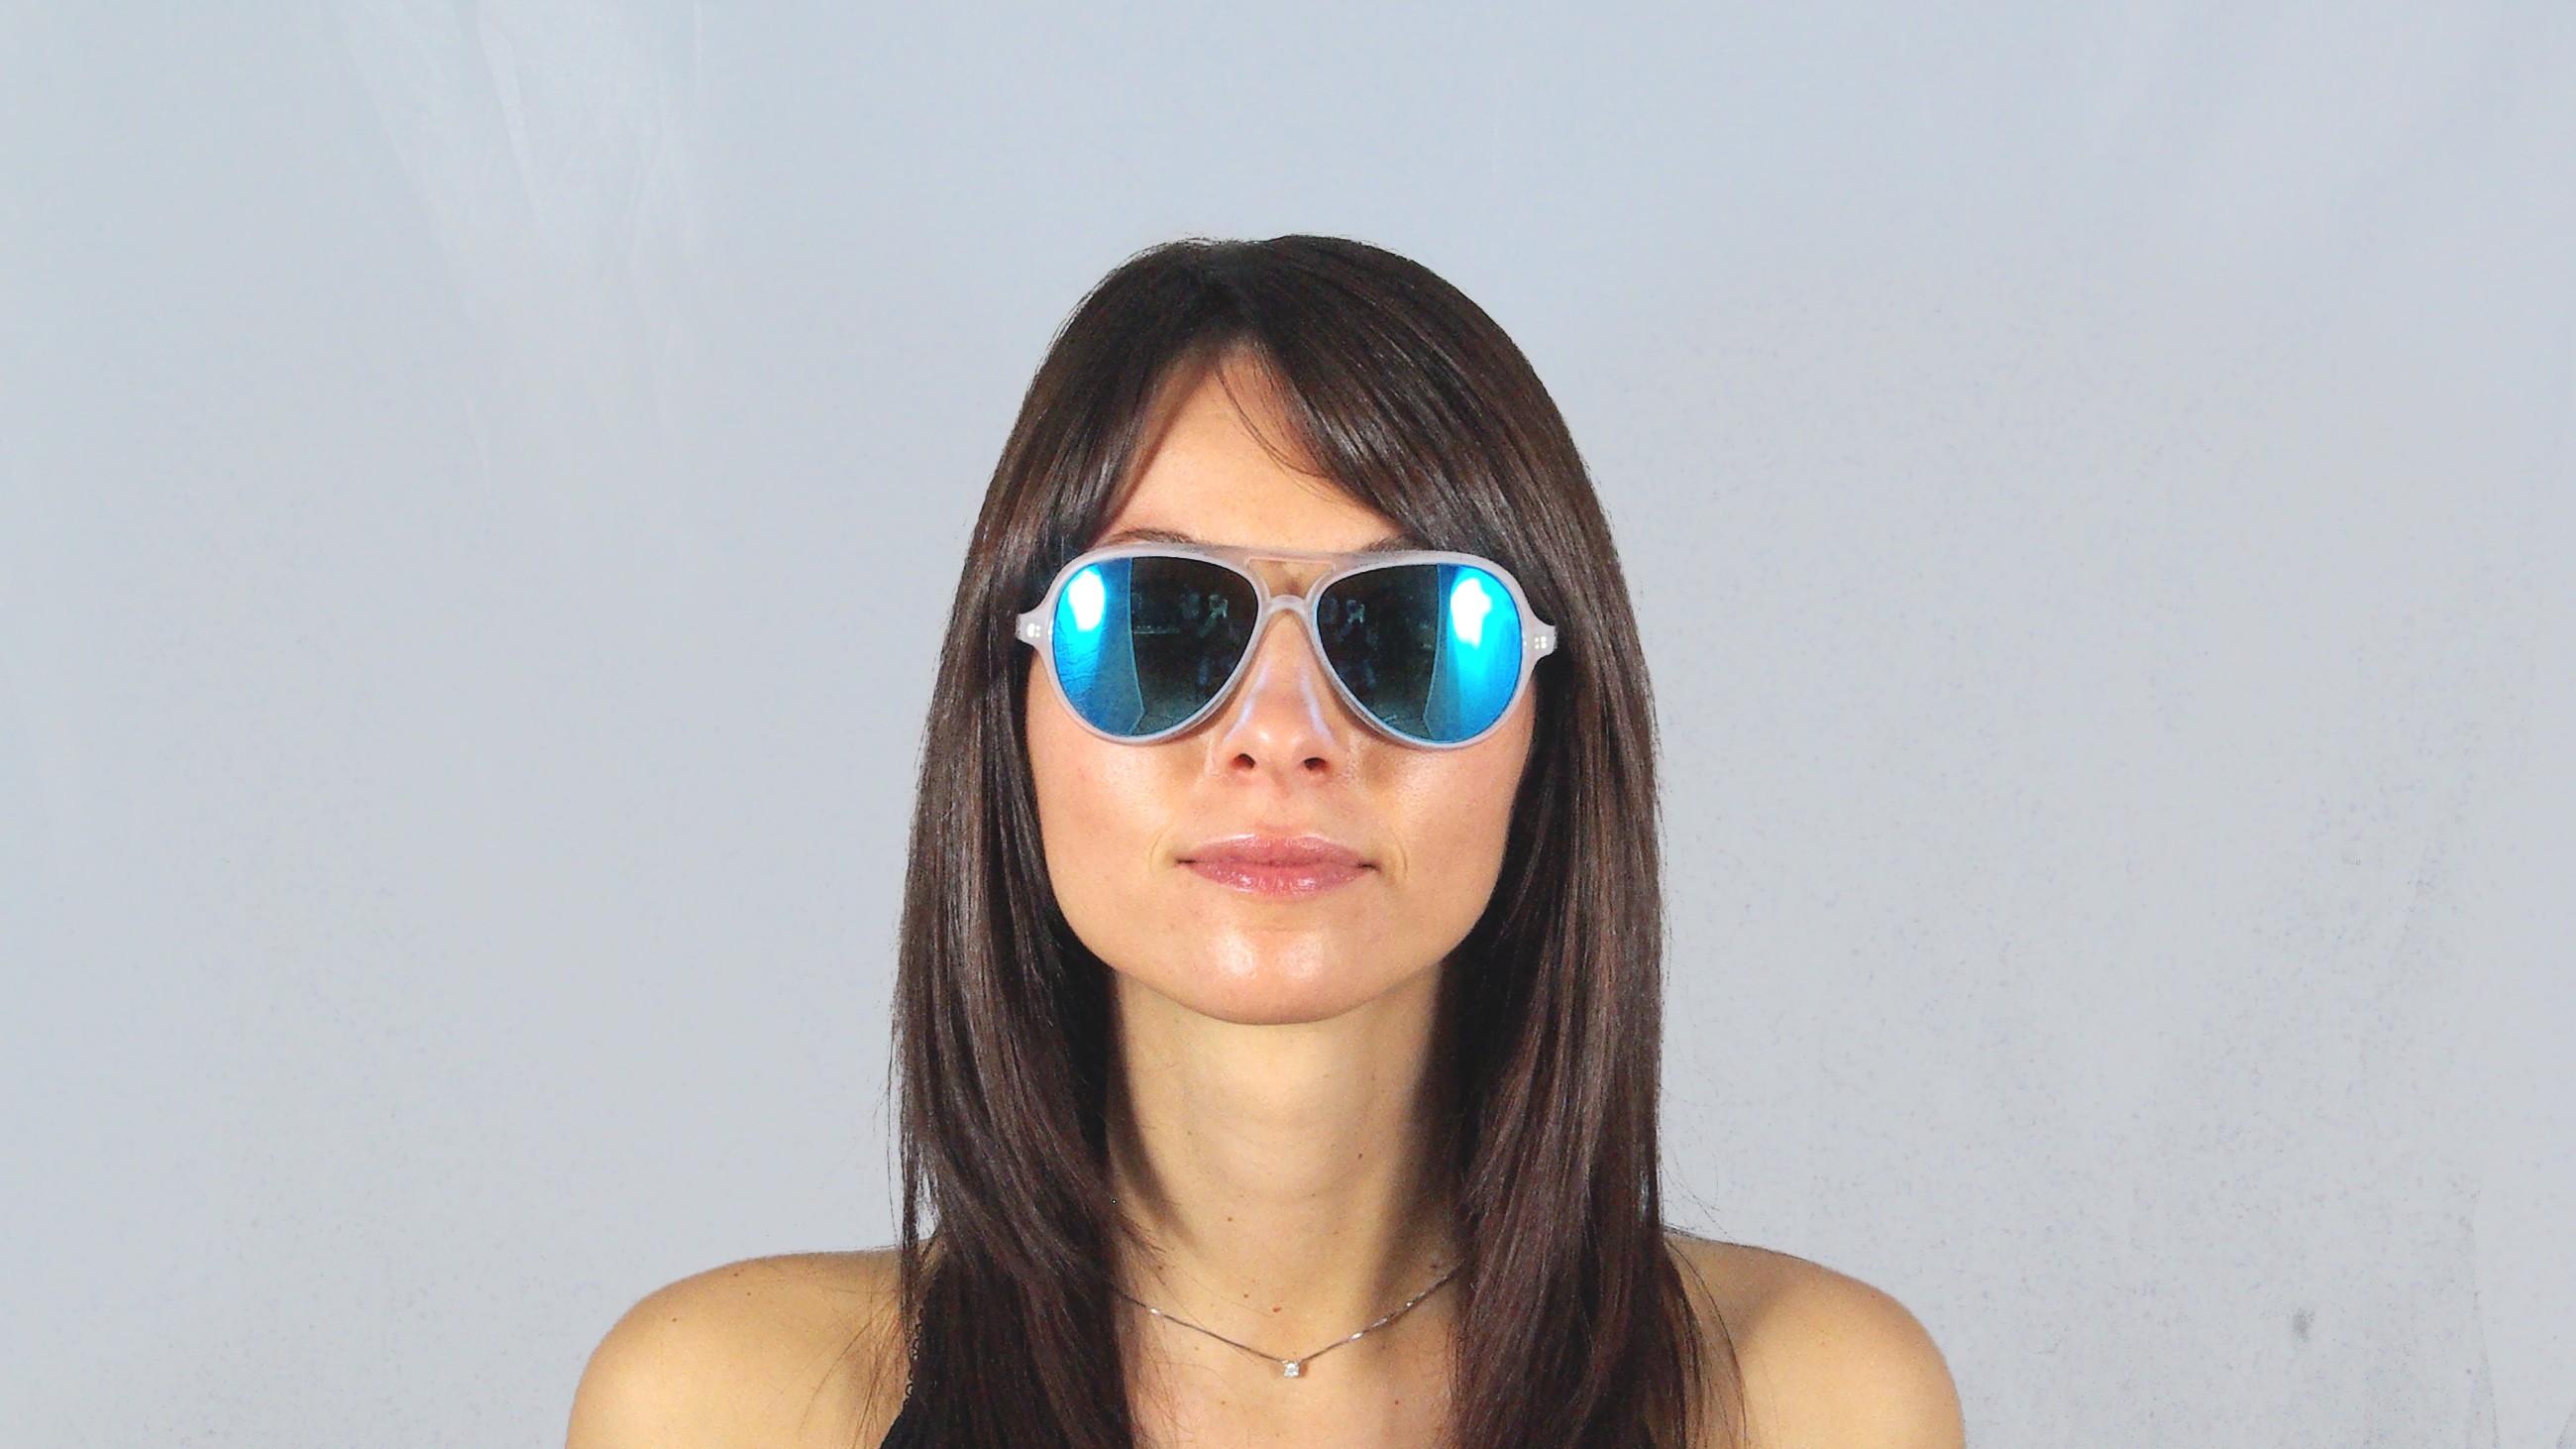 e61d1780e ... shop sunglasses ray ban rb 4125 cats 5000 646 17 transparent mirrored  blue flash lenses small